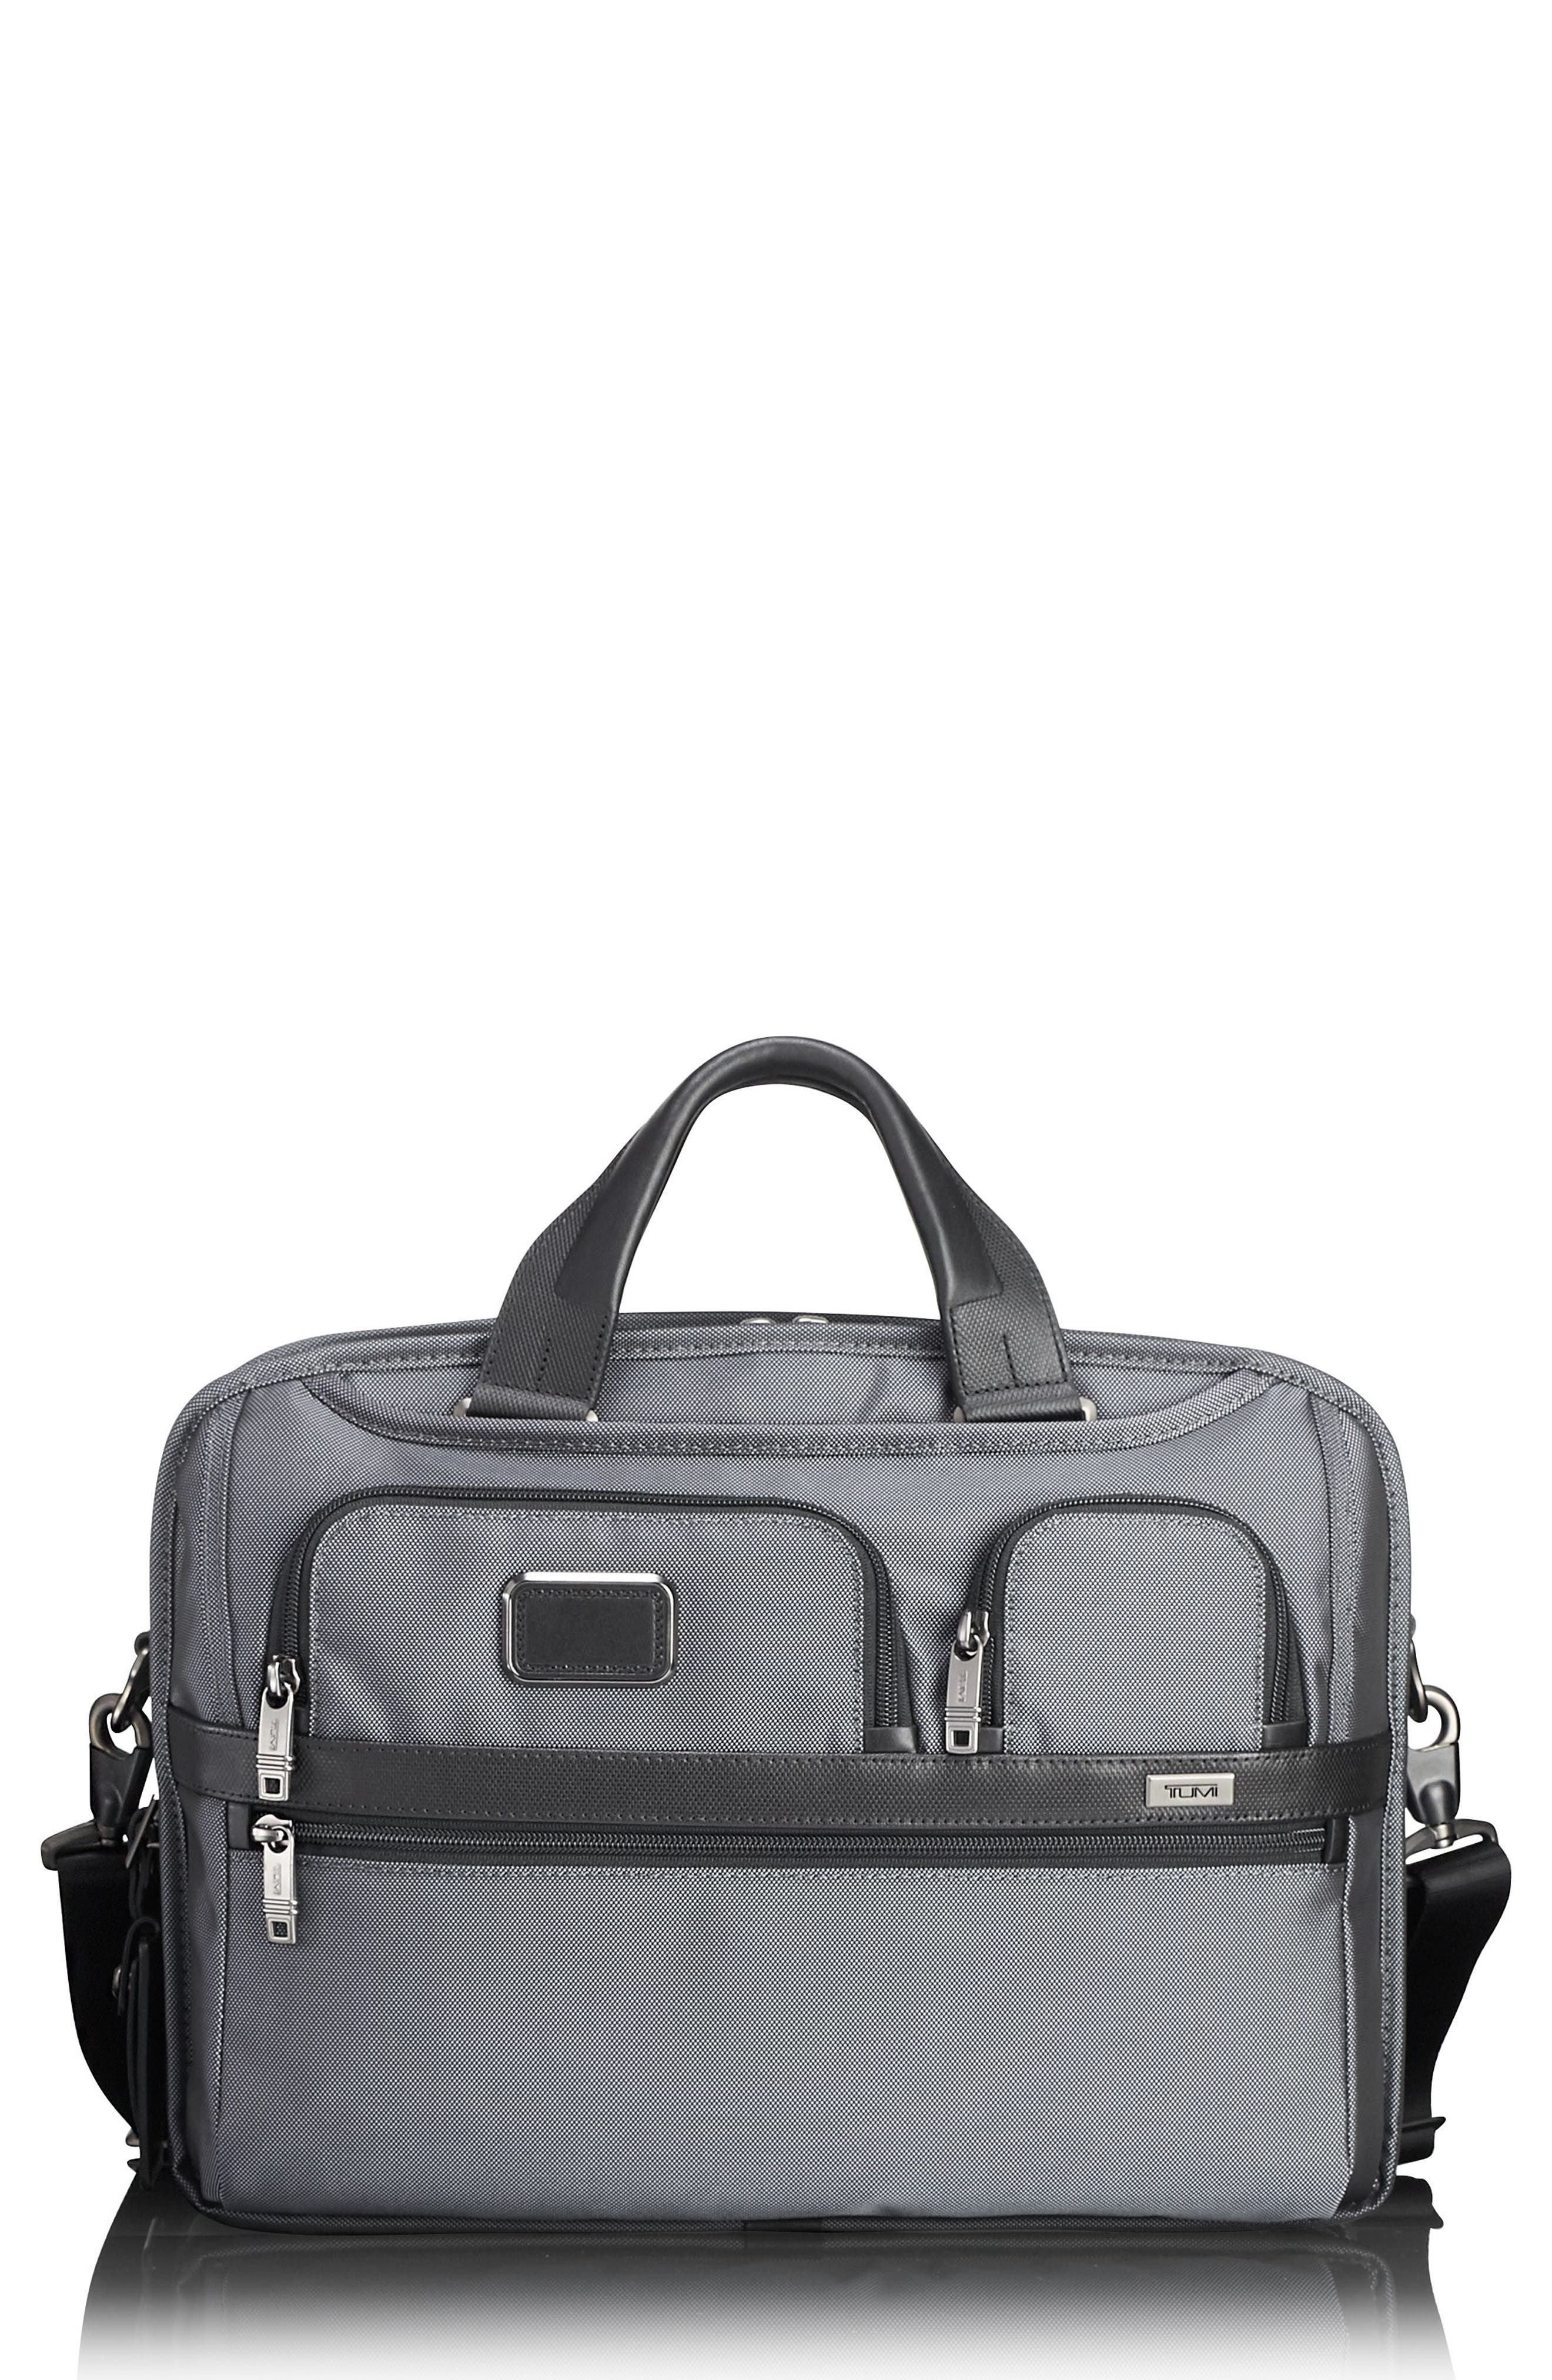 T-Pass® Medium Screen Laptop Slim Briefcase in Pewter